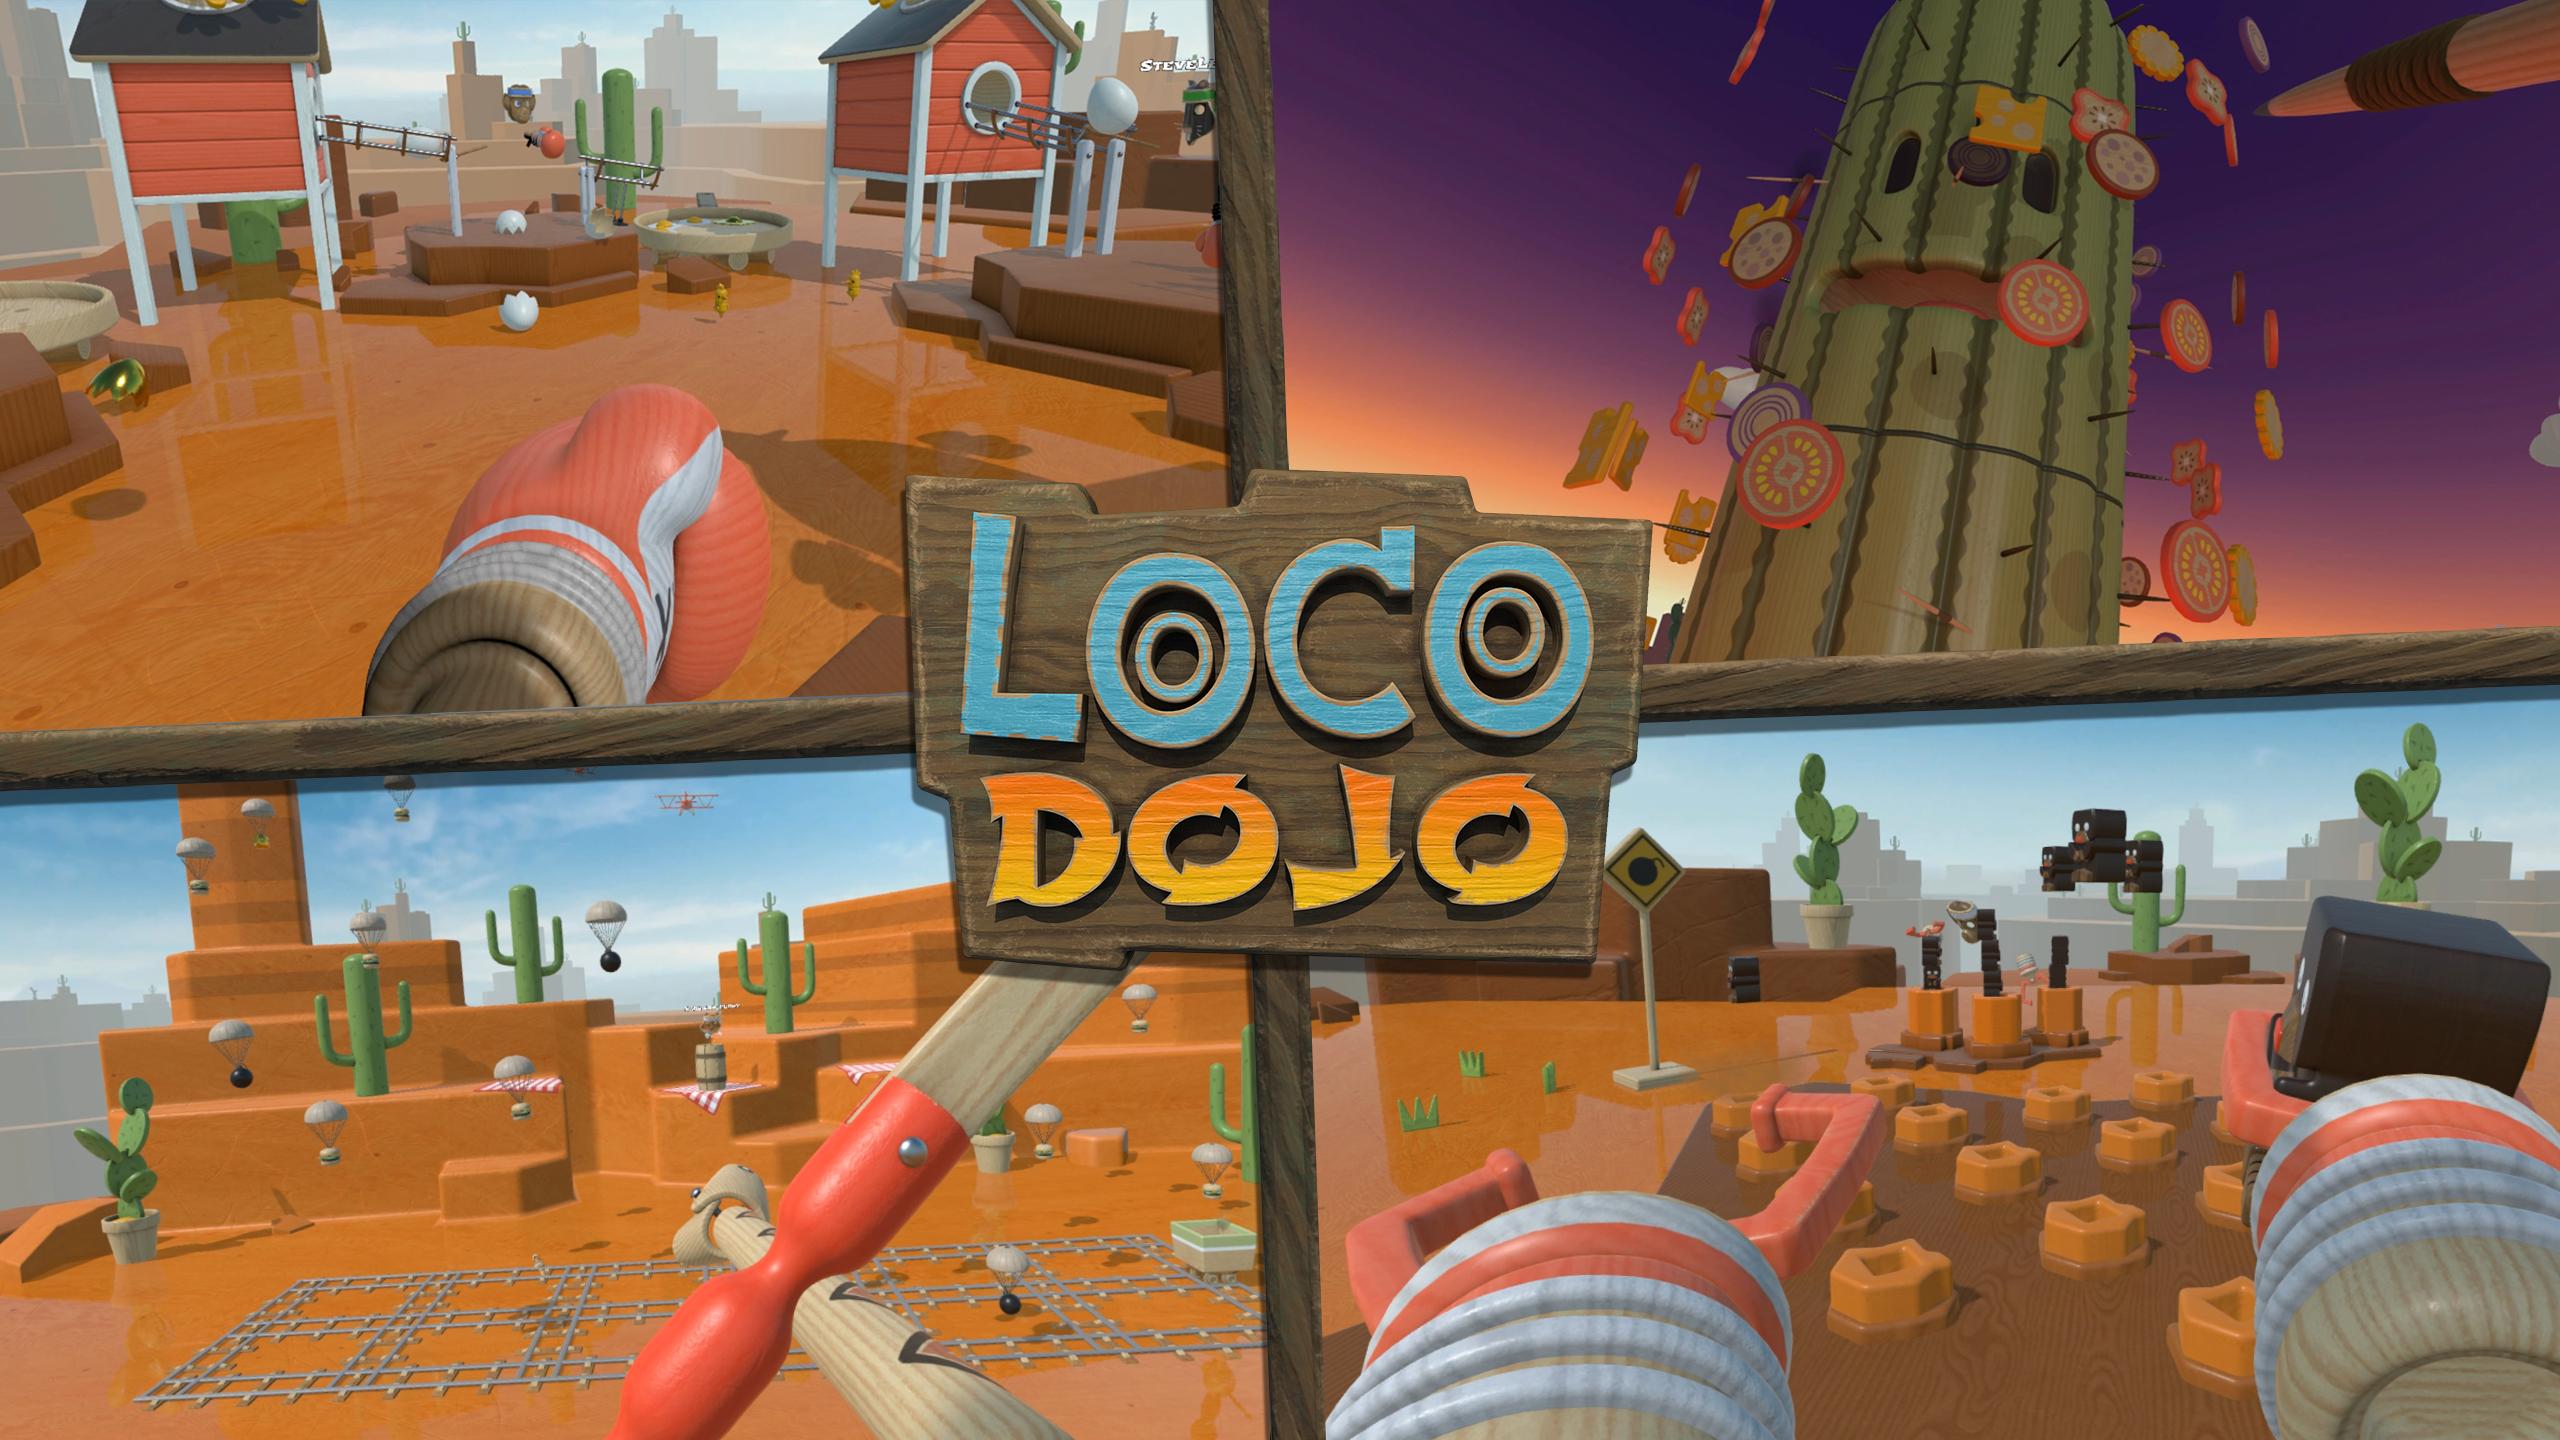 3_LocoDojoScreenshot_RockyDesert.png